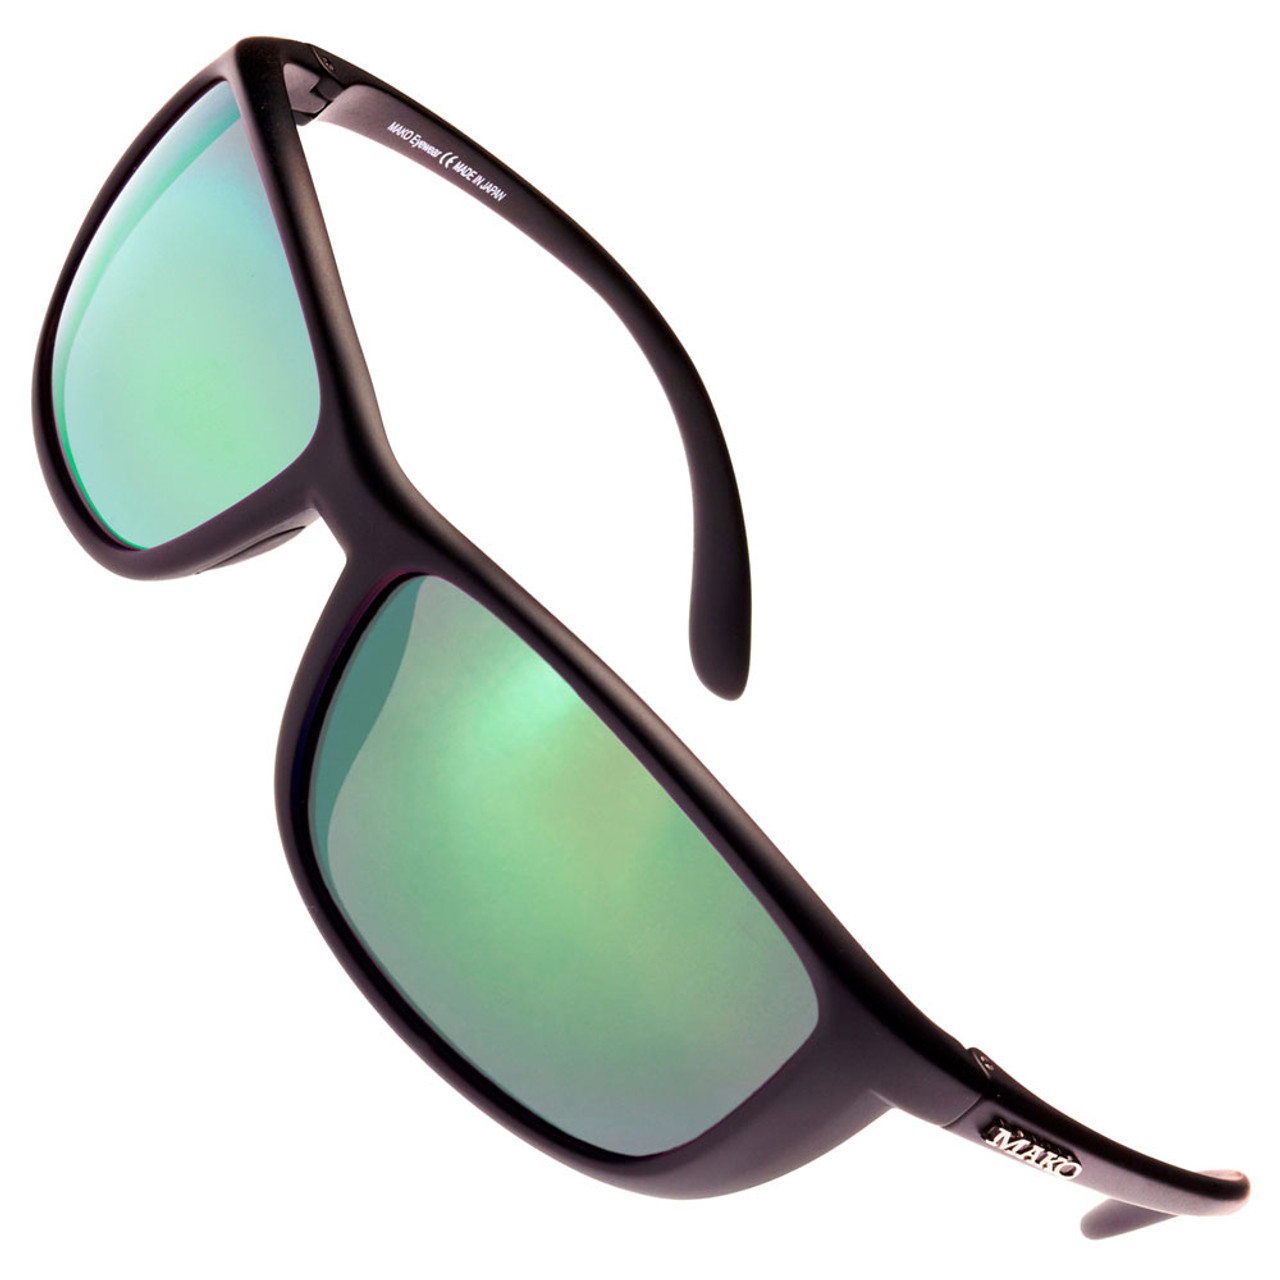 22f7eeaff3 ... Mako Blade Glass Copper Green Mirror 9569 M01-G2H5 ...